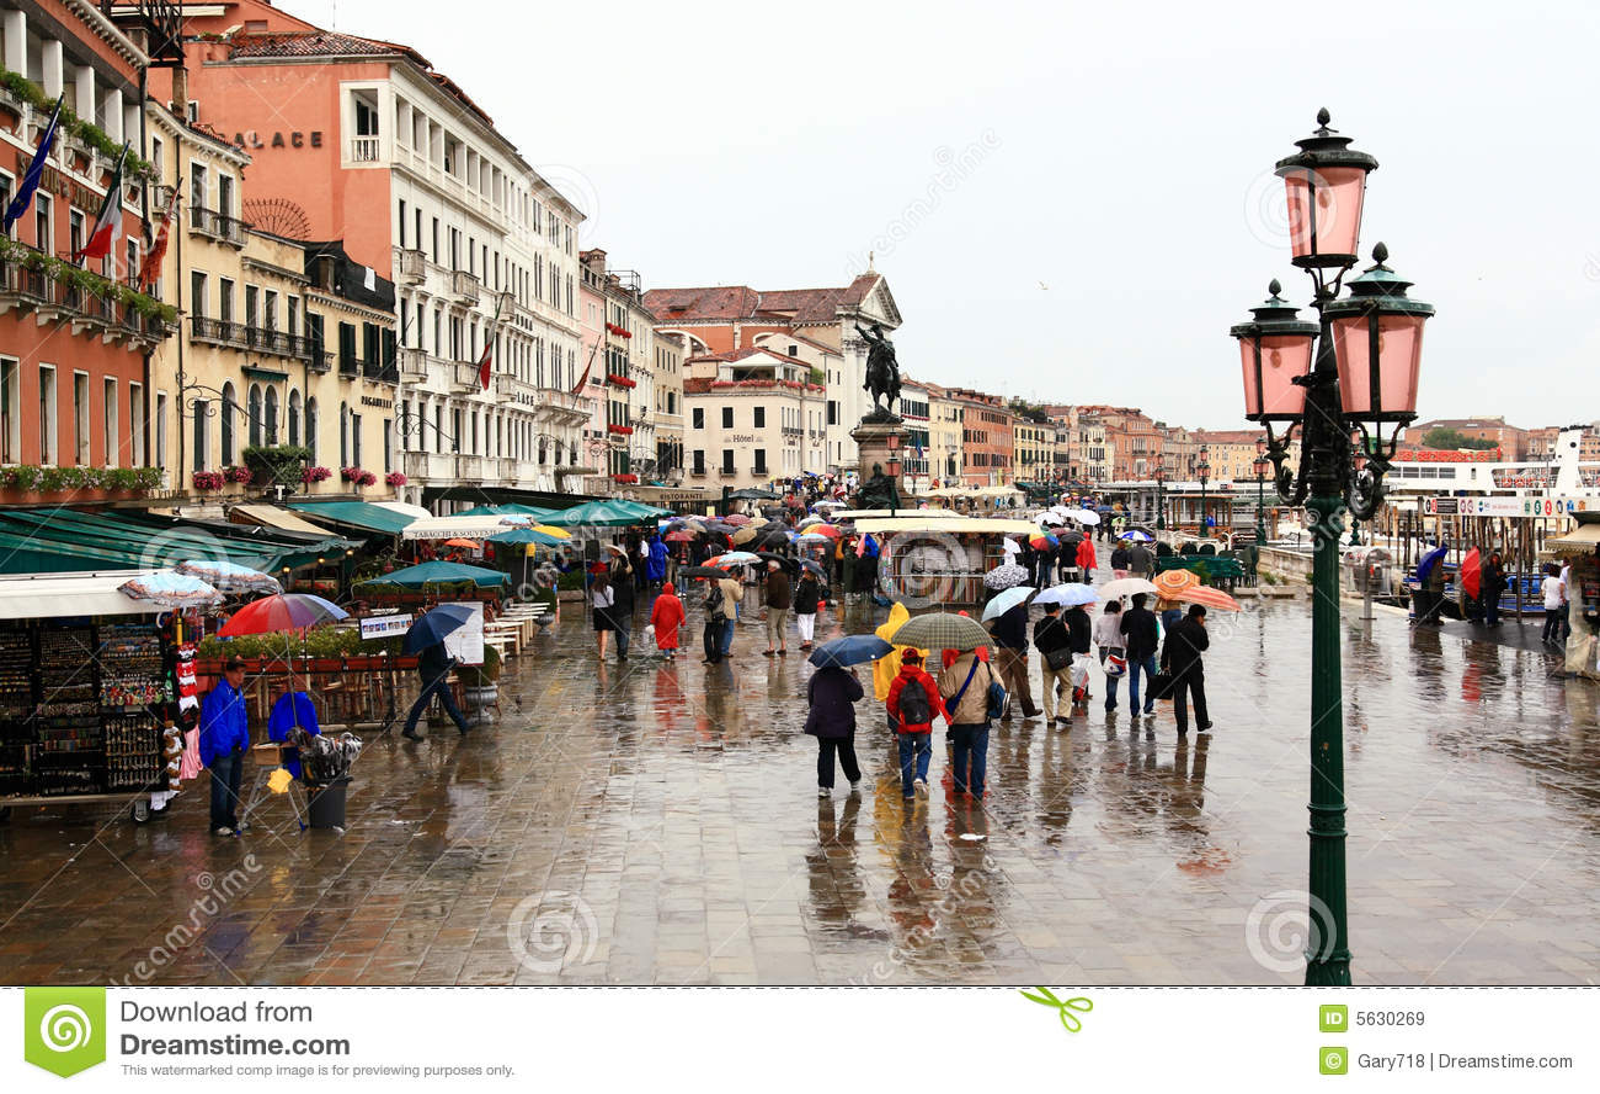 La plaza Venezia del San Marco